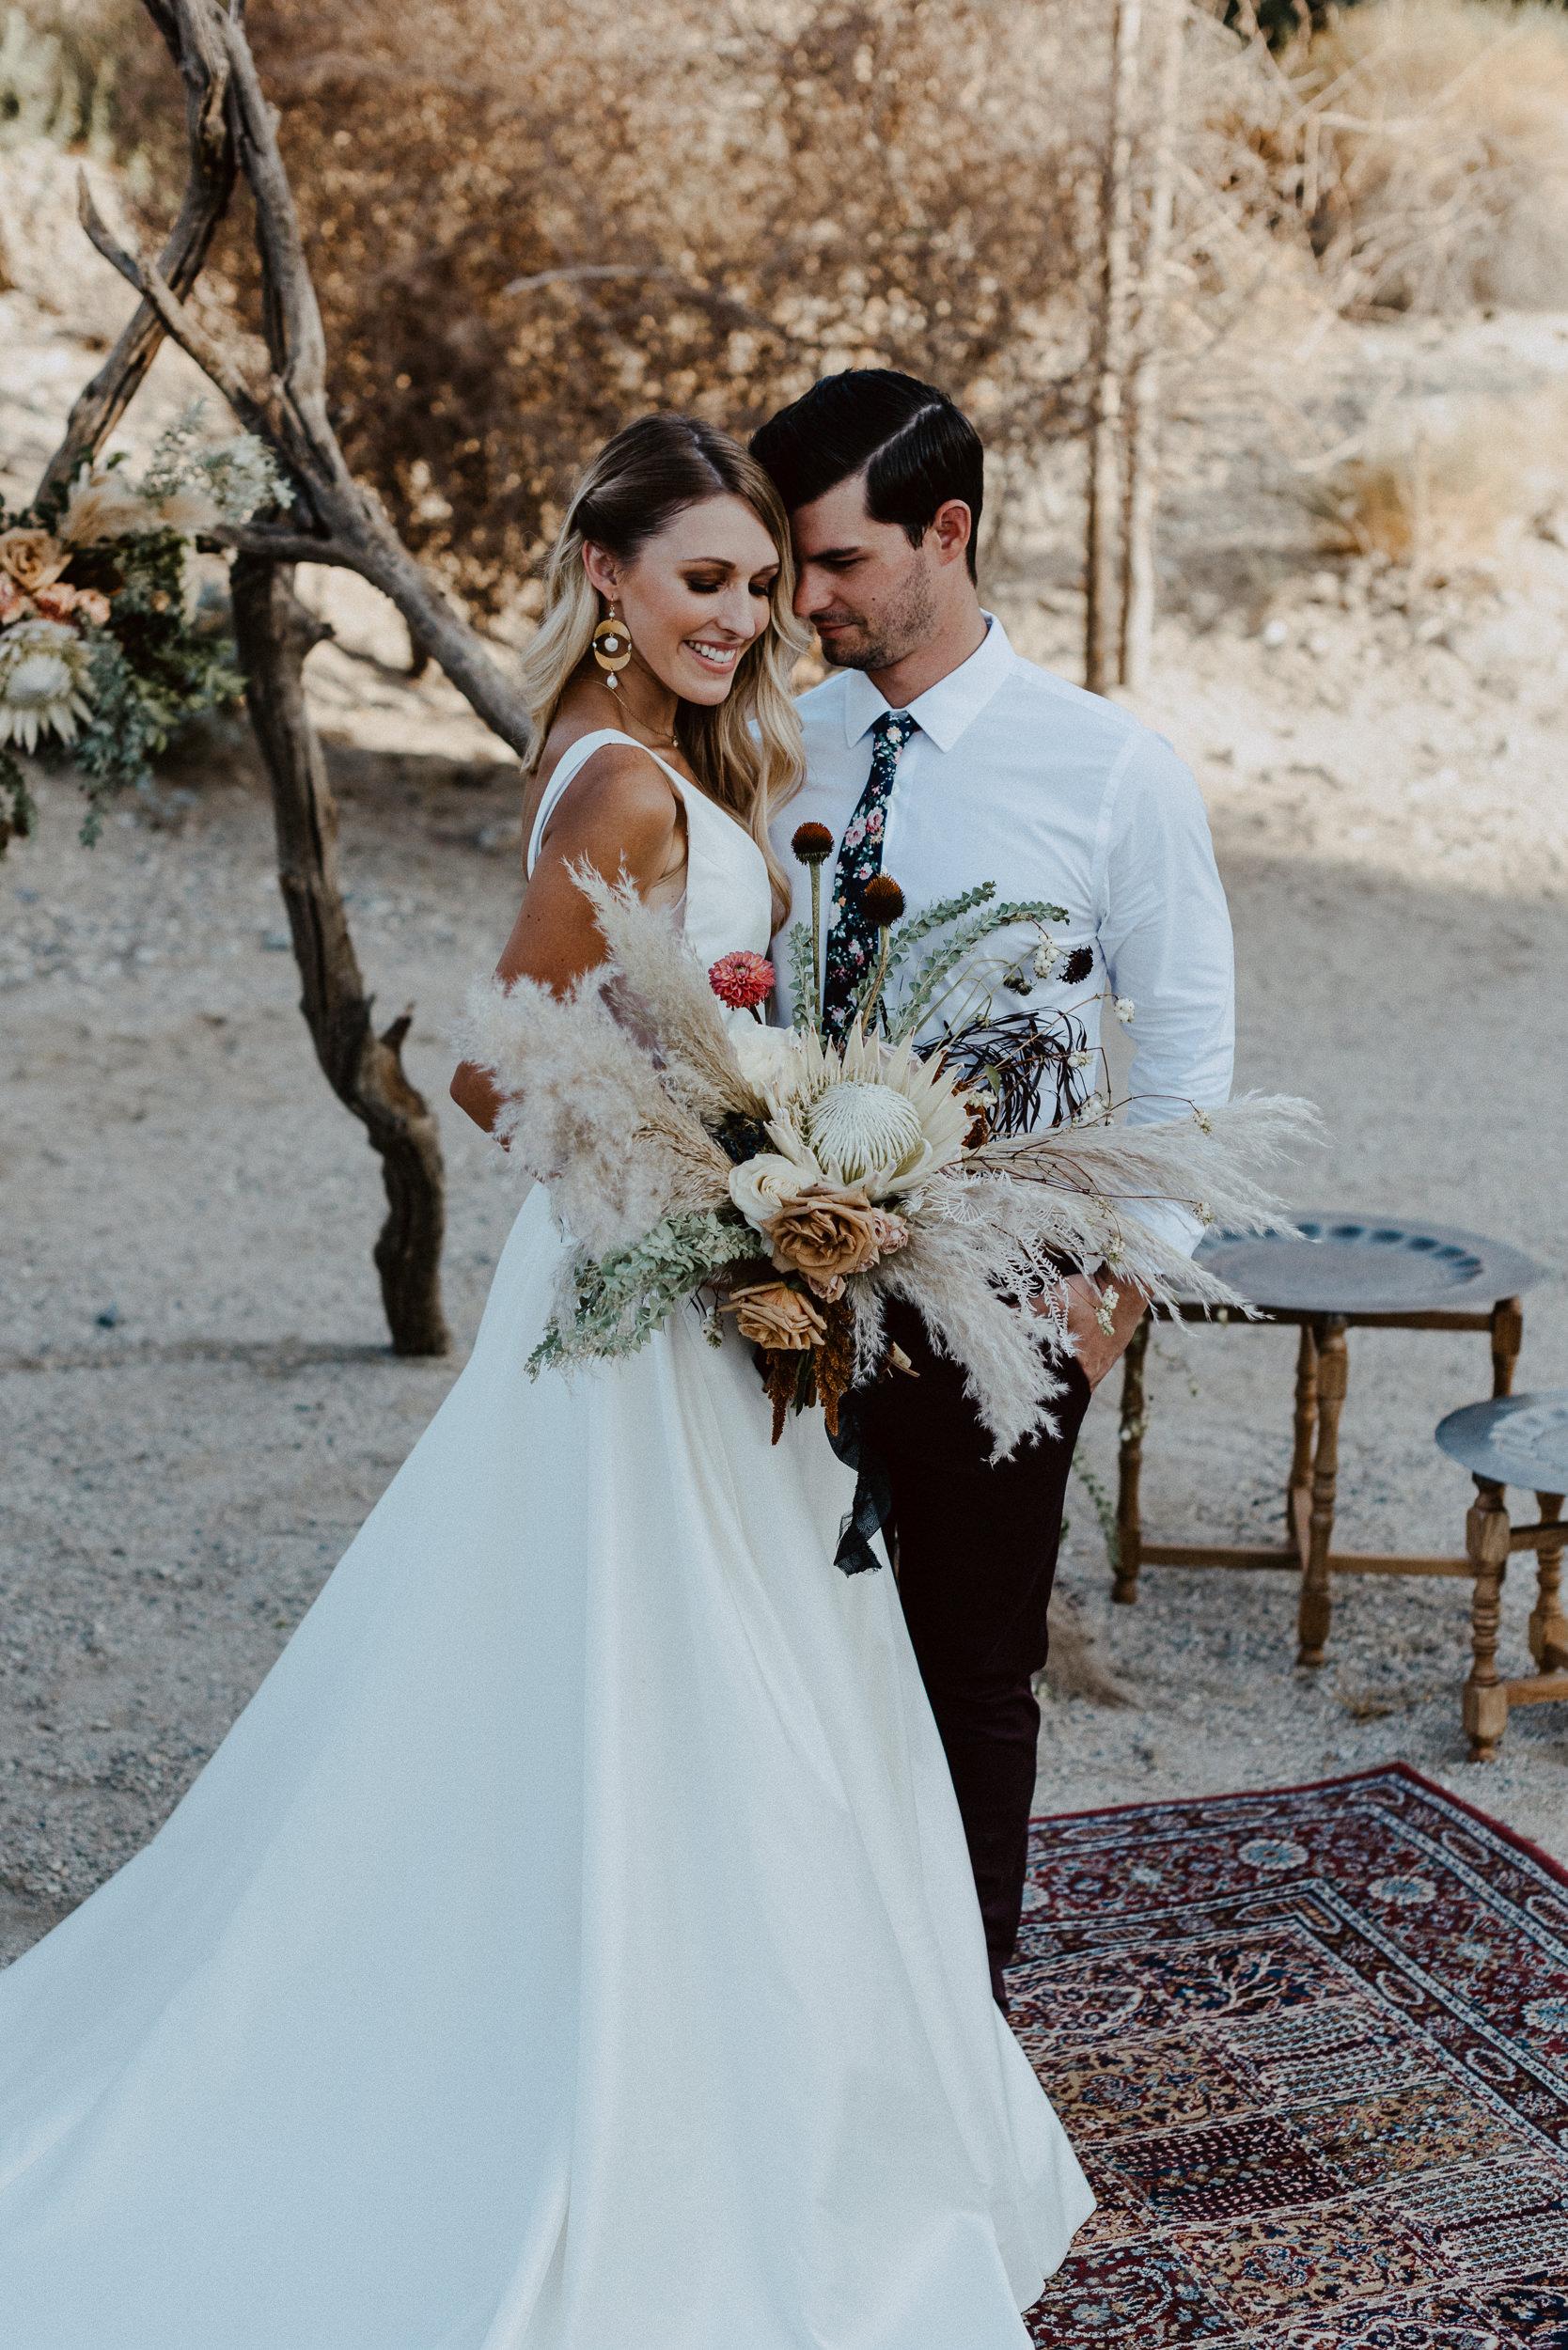 sChelsie + Chris - The Desert Shootout Wedding Romantics at The Living Desert-47.jpg